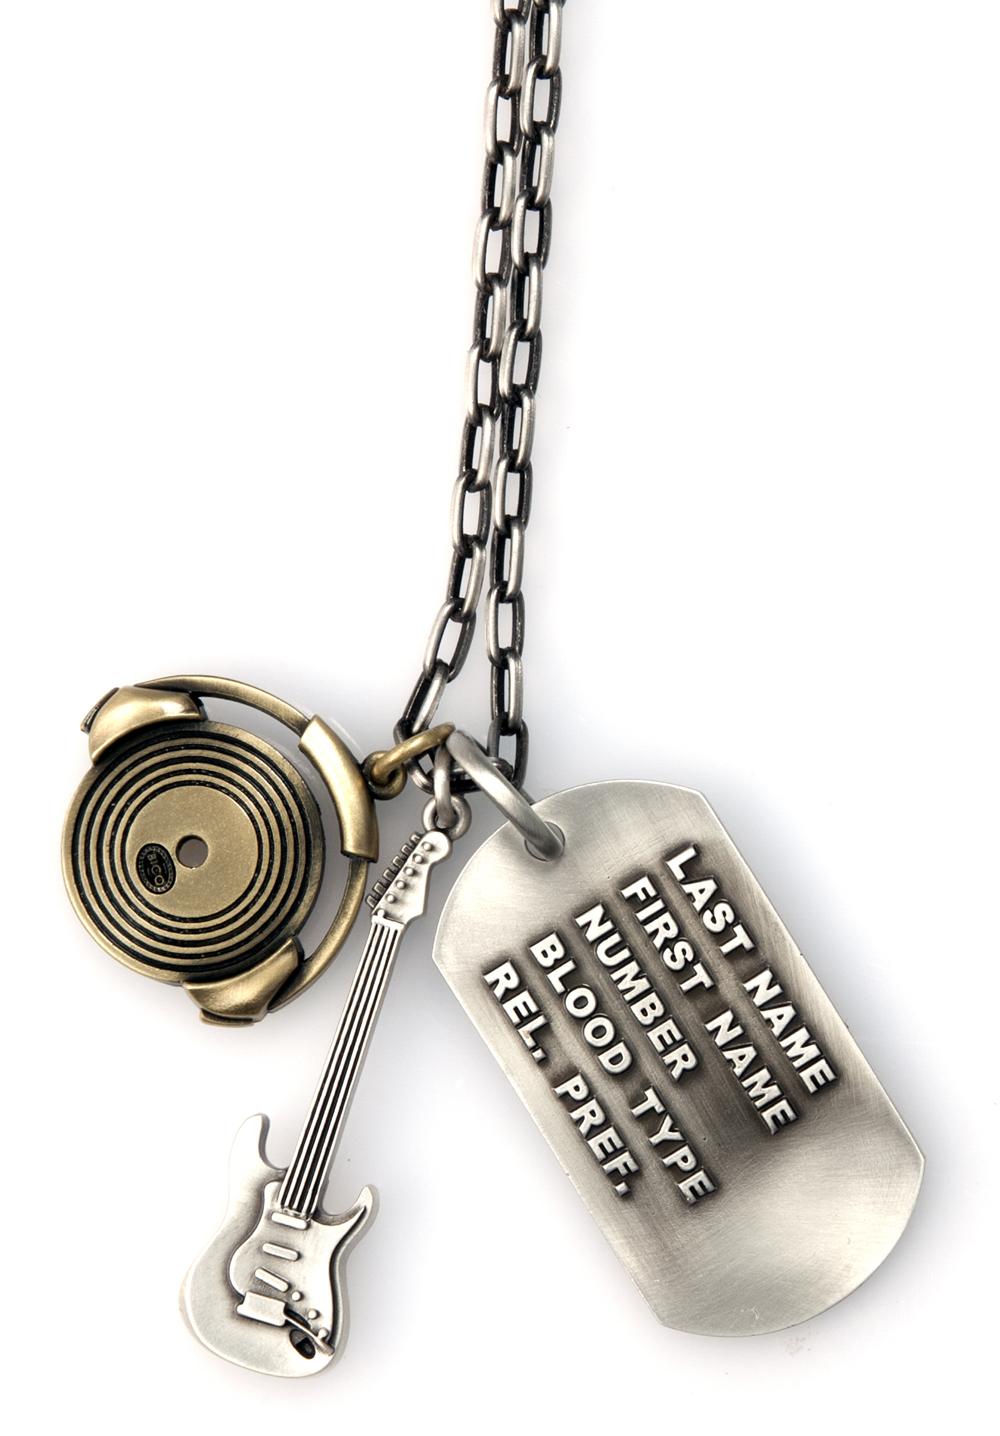 Session grunt bico australia for Bico australia jewelry pendants